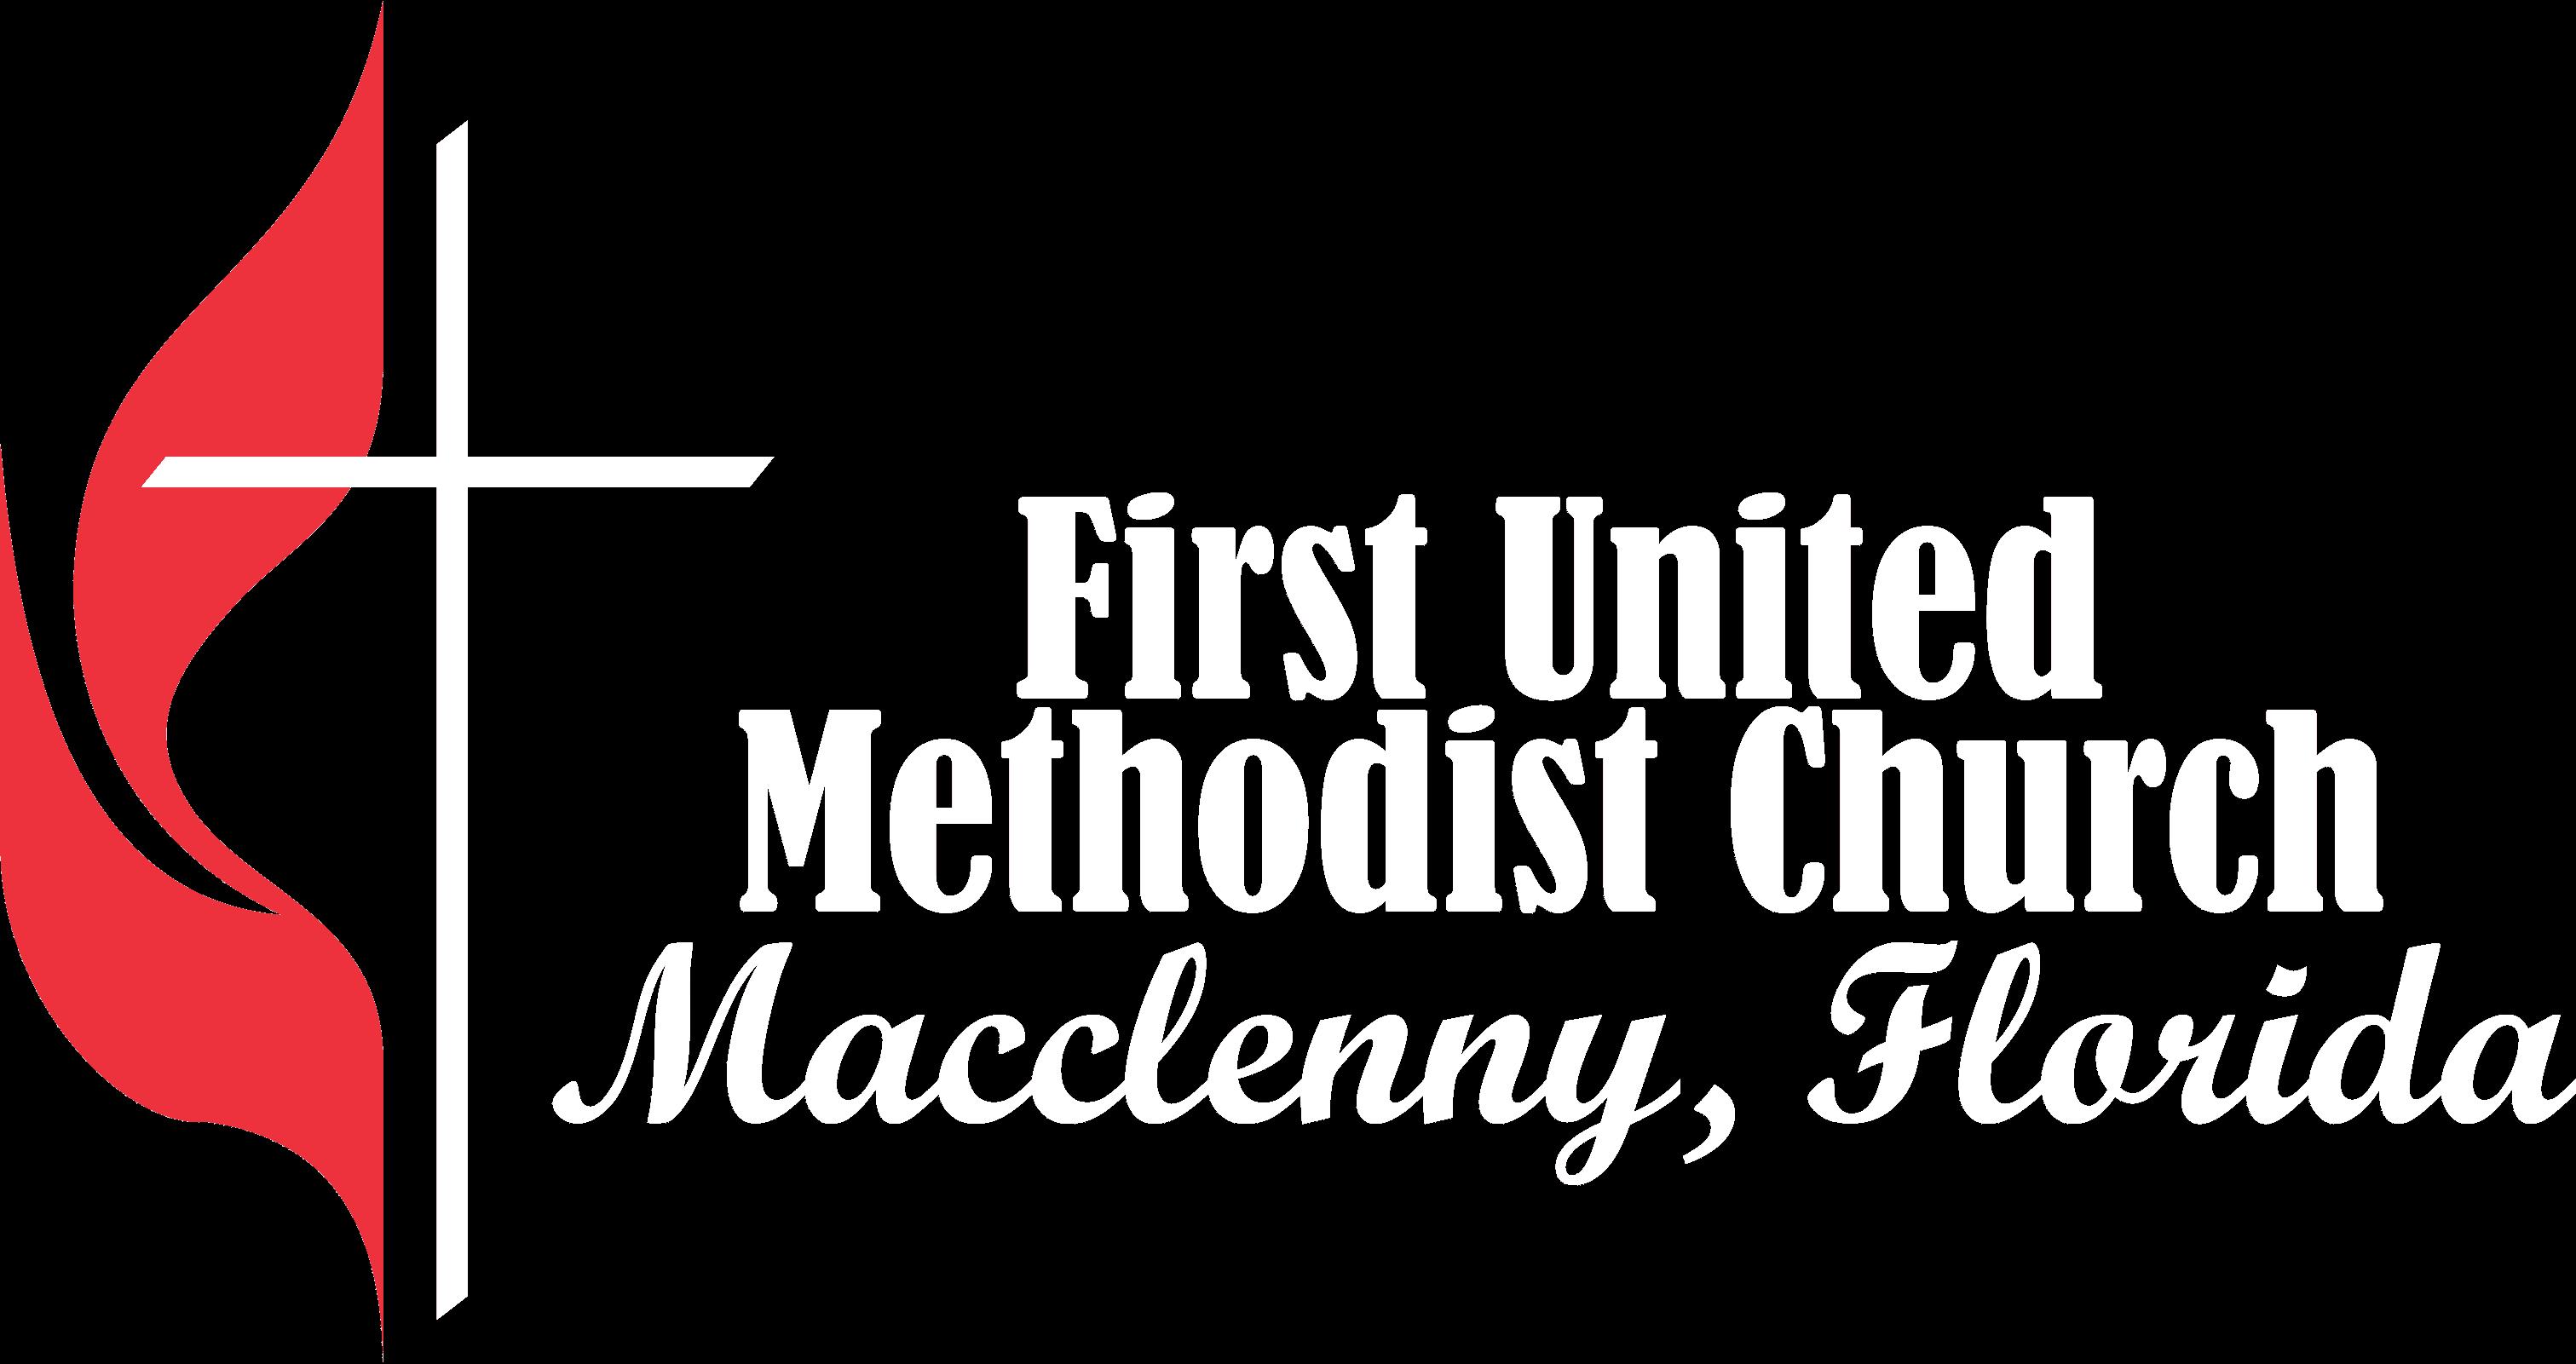 First United Methodist Church of Macclenny